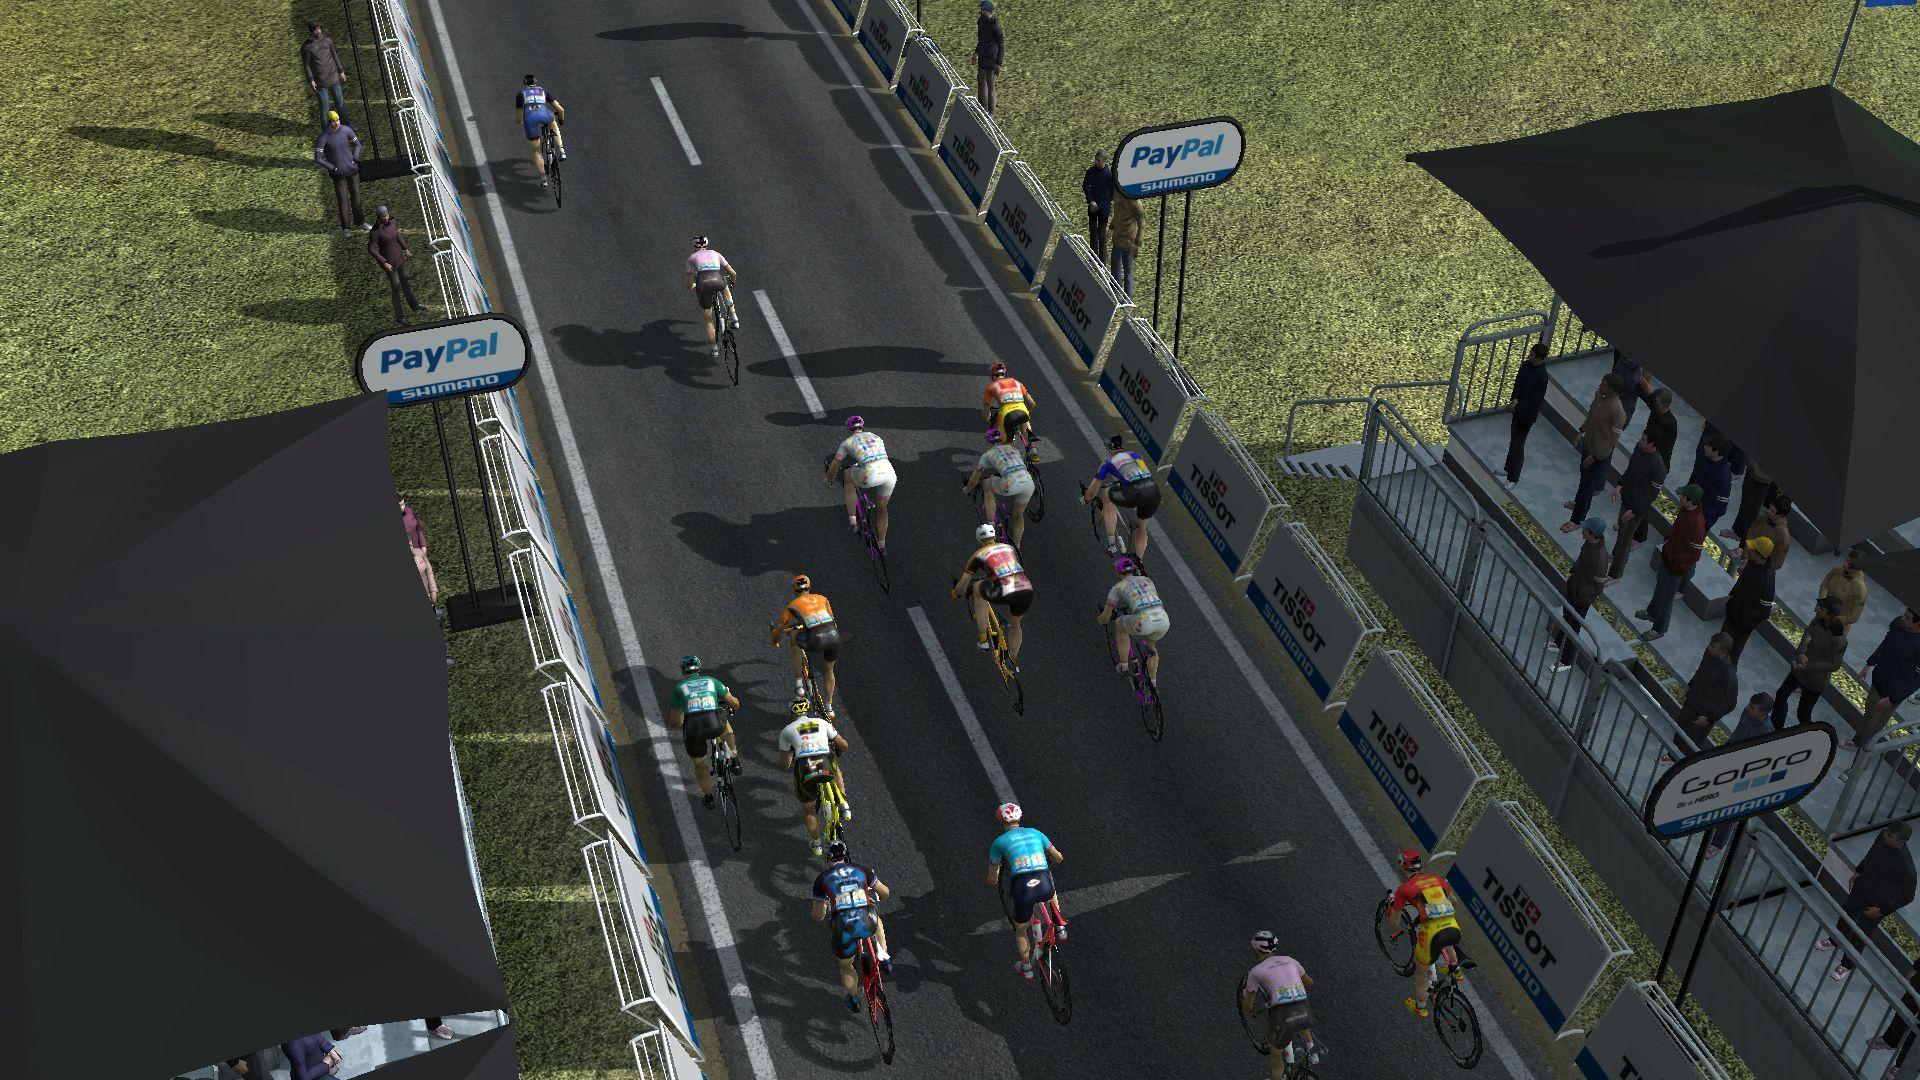 pcmdaily.com/images/mg/2018/Races/C1/TdU/mg18_tdu_02_PCM0054.jpg